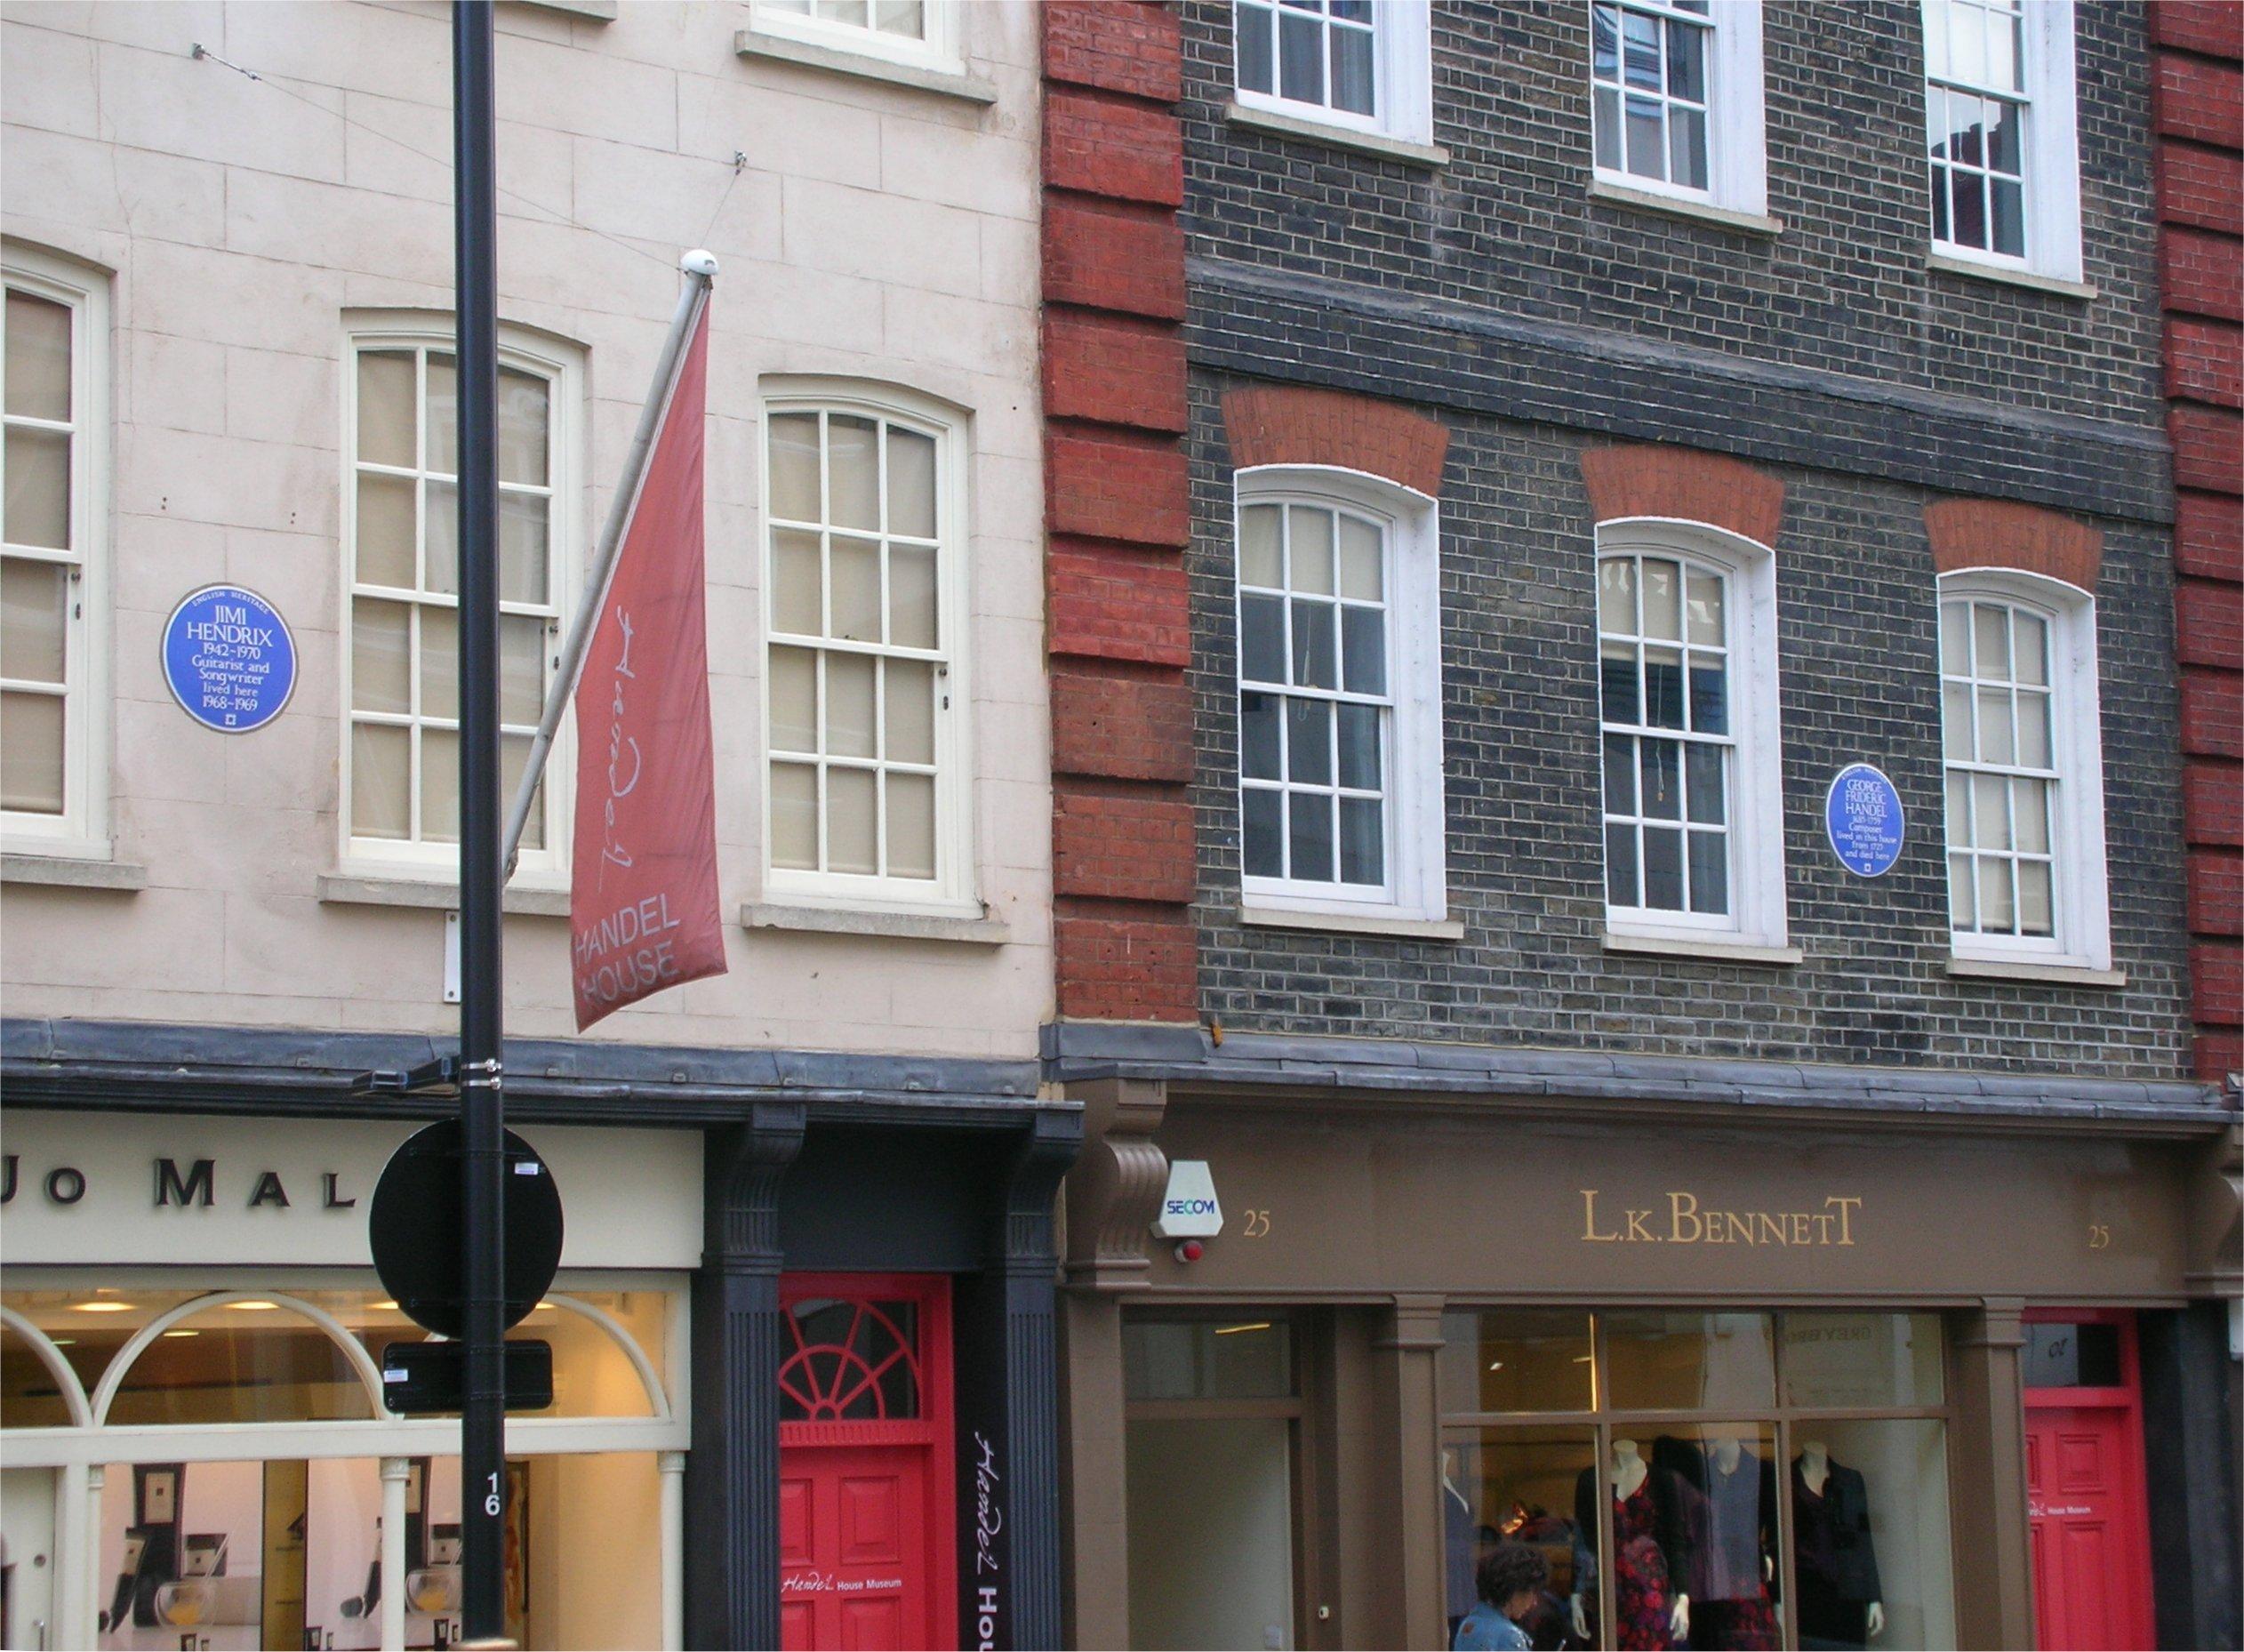 Hendrix_and_Handel_houses_Brook_Street